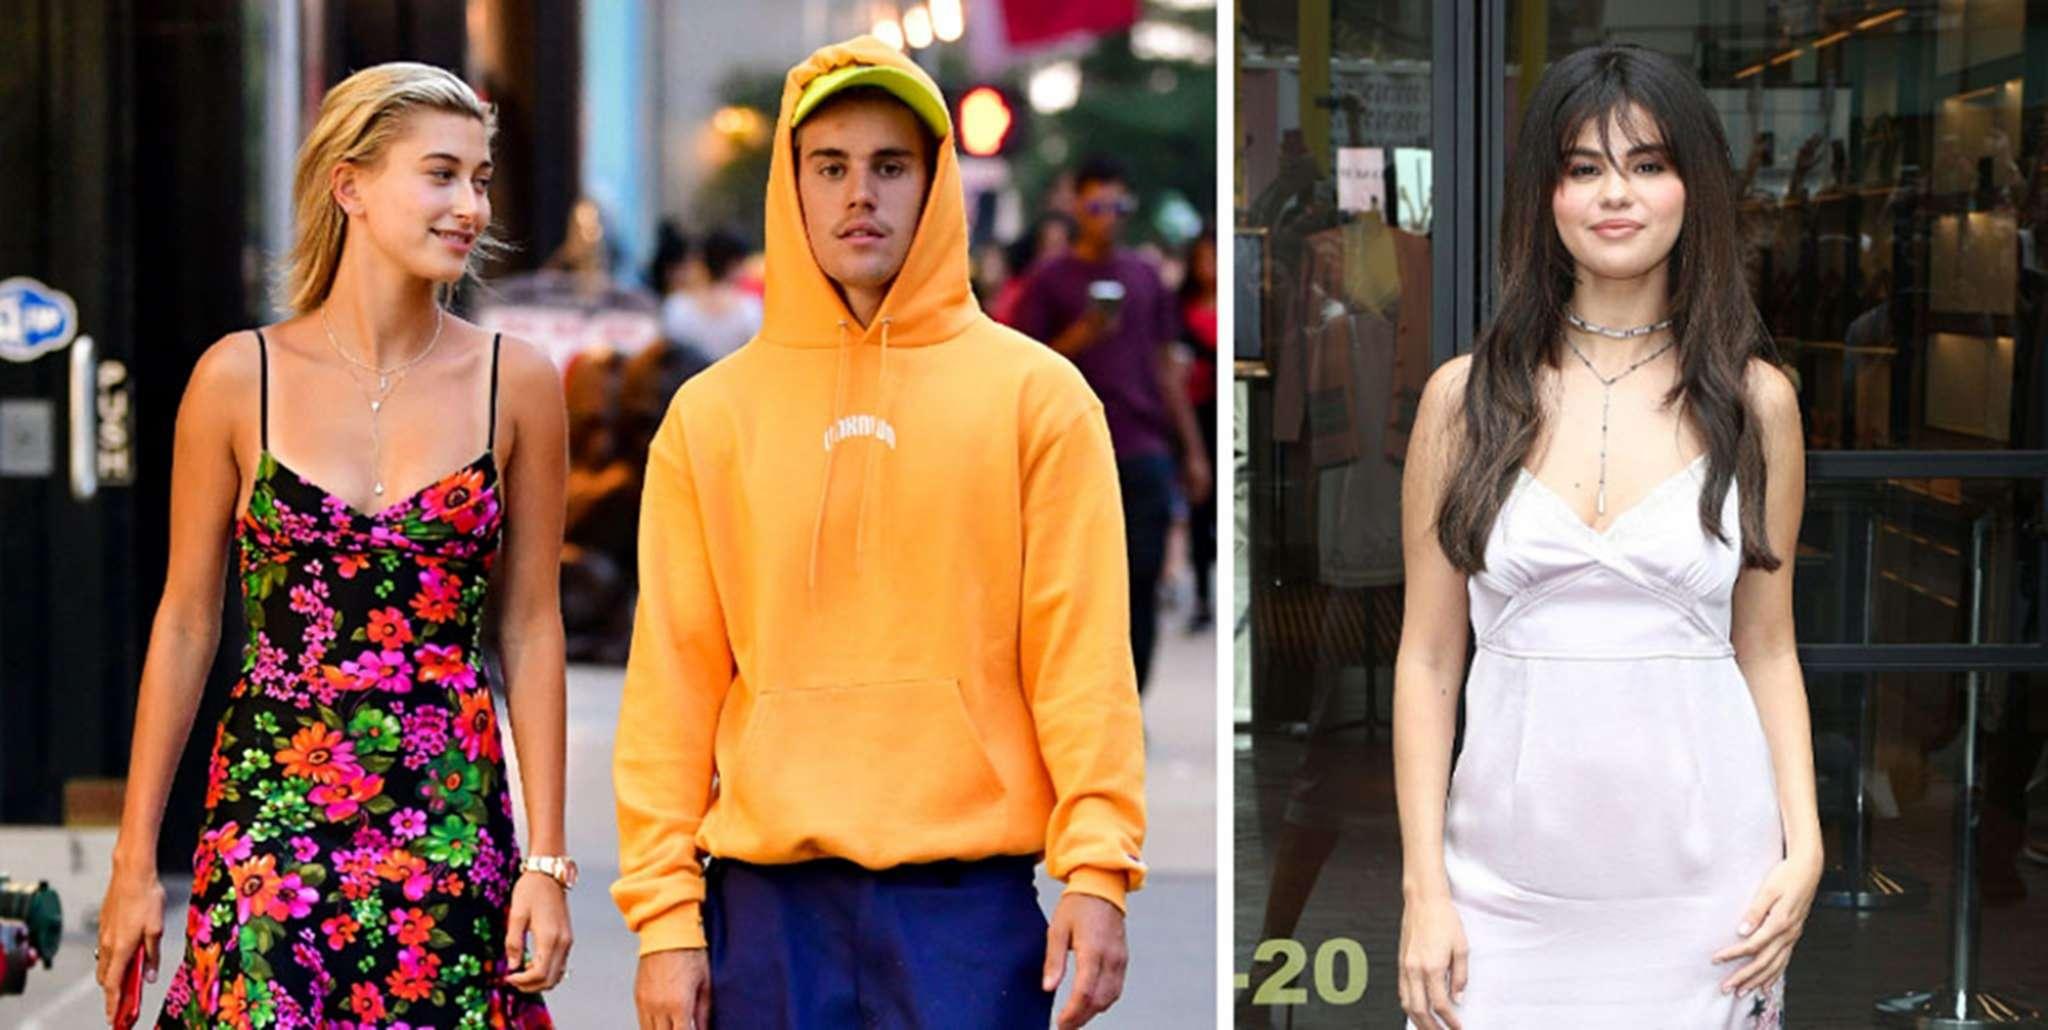 Hailey Bieber Justin Bieber Selena Gomez